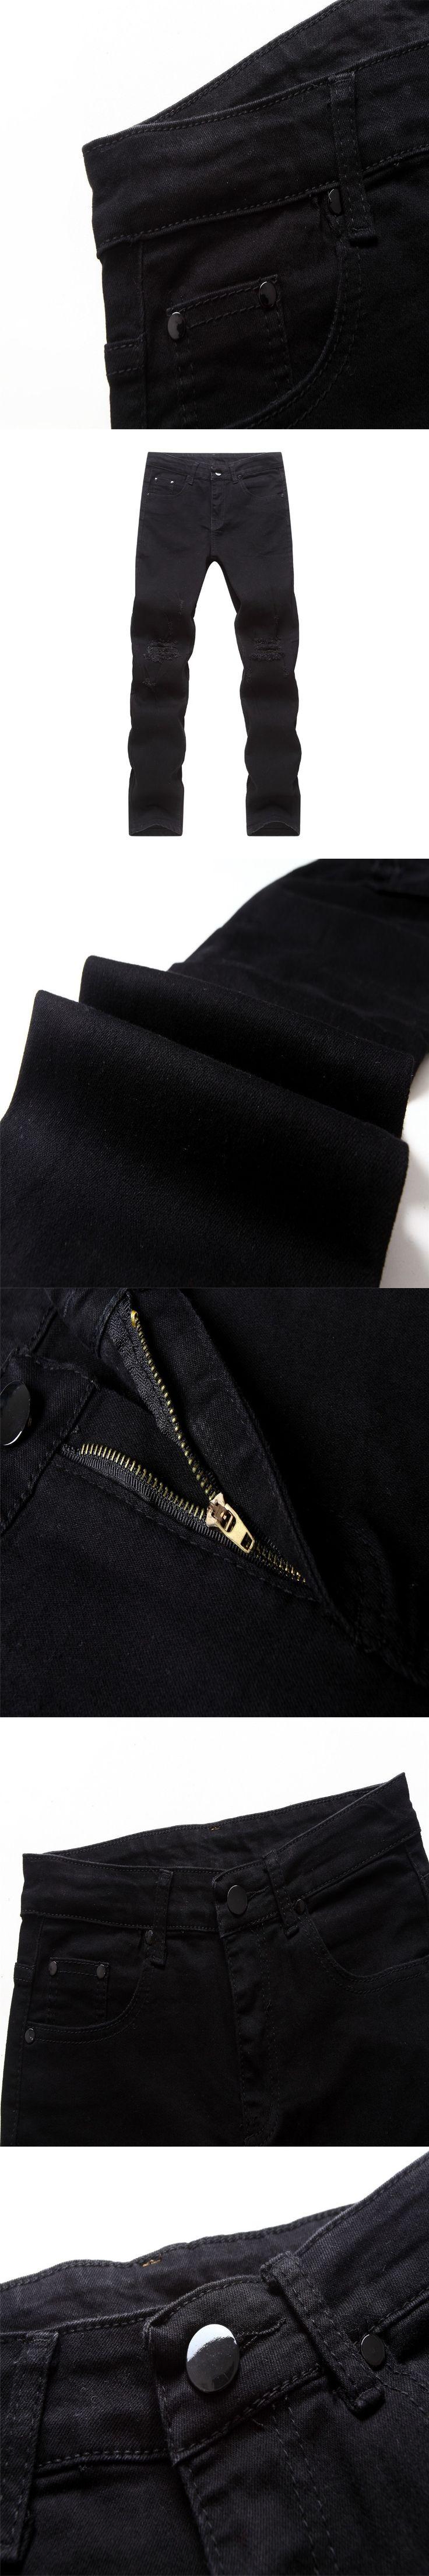 New Fashion Mens Slim Fit Jeans Moto Denim Joggers Pleated Jean Pants Cheap Straight Leg Jeans for Men Deep Black